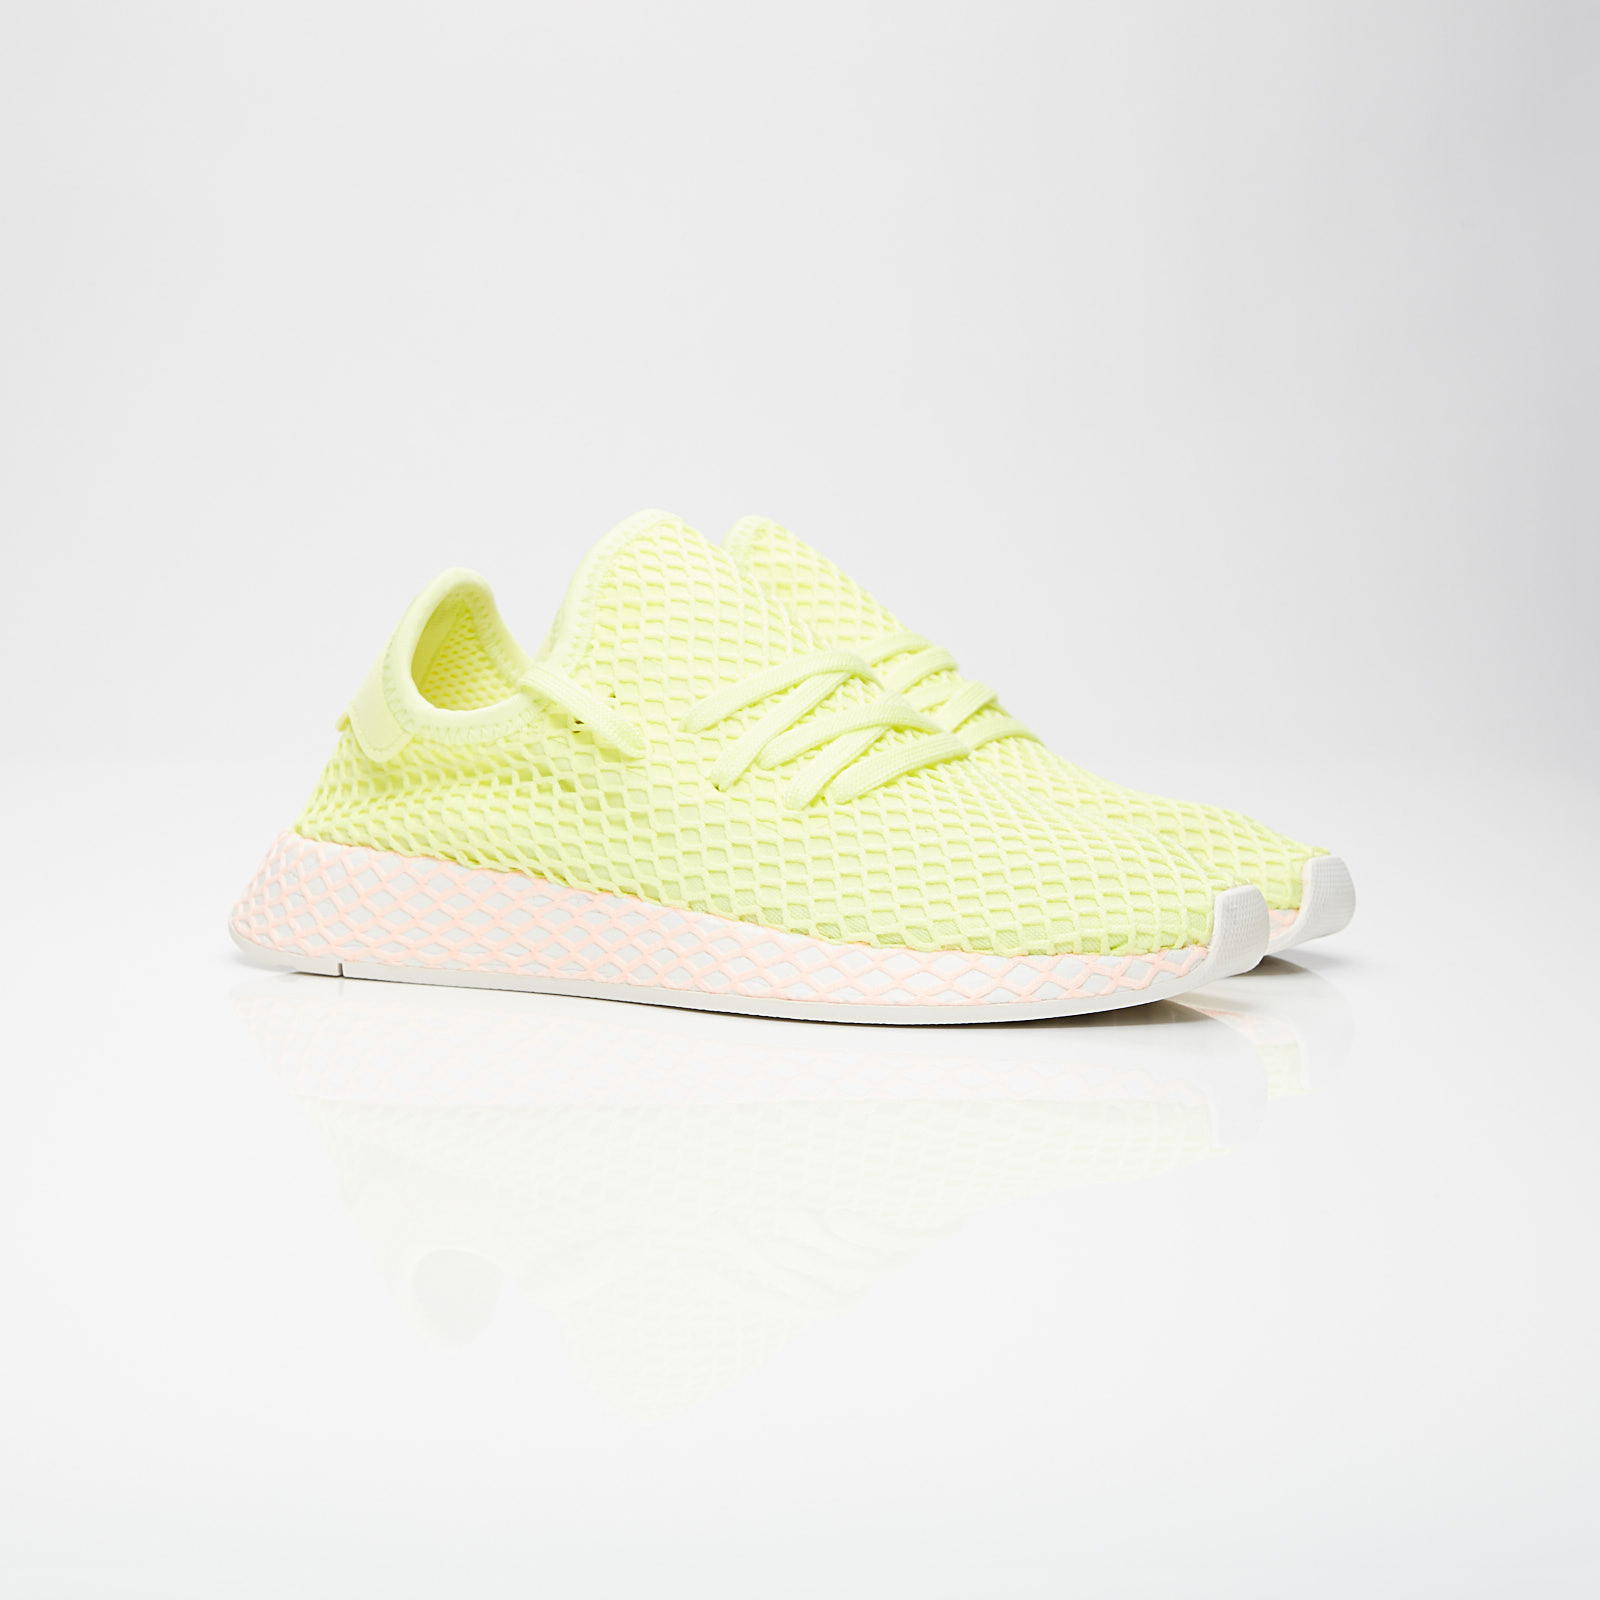 7a834b1c5 adidas Deerupt W - B37599 - Sneakersnstuff